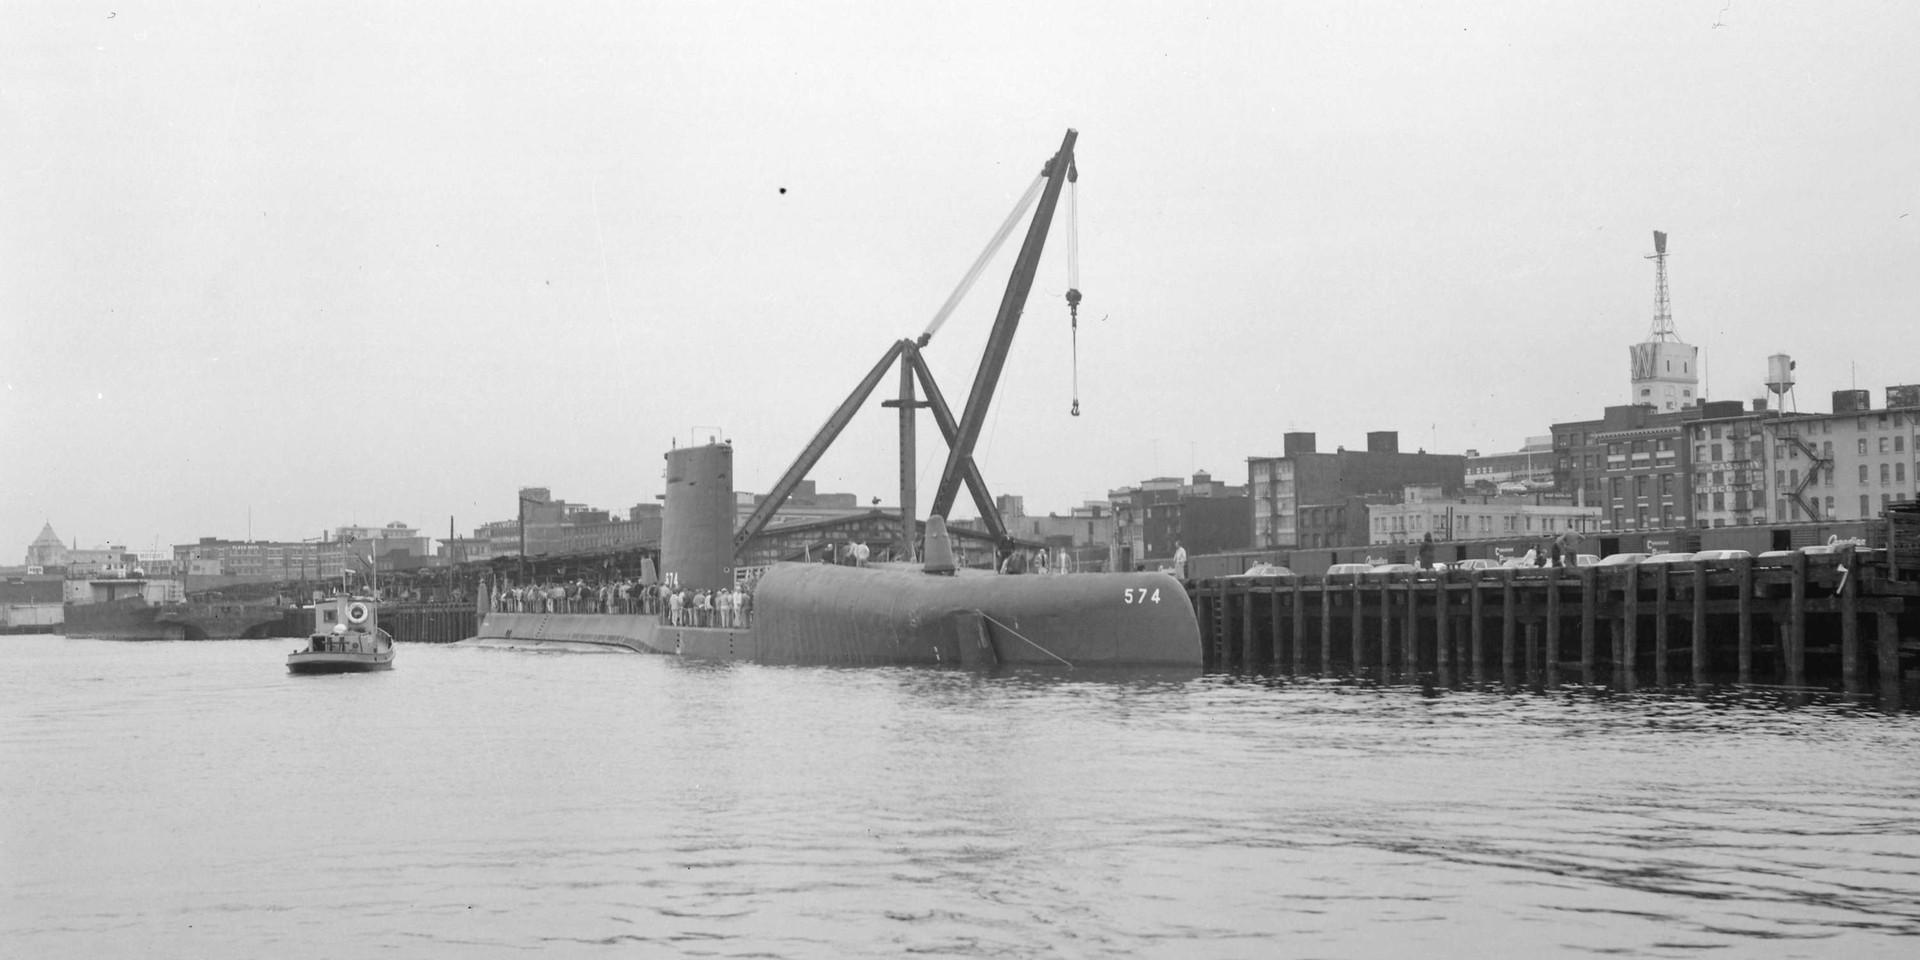 USS Grayback (SS-574)